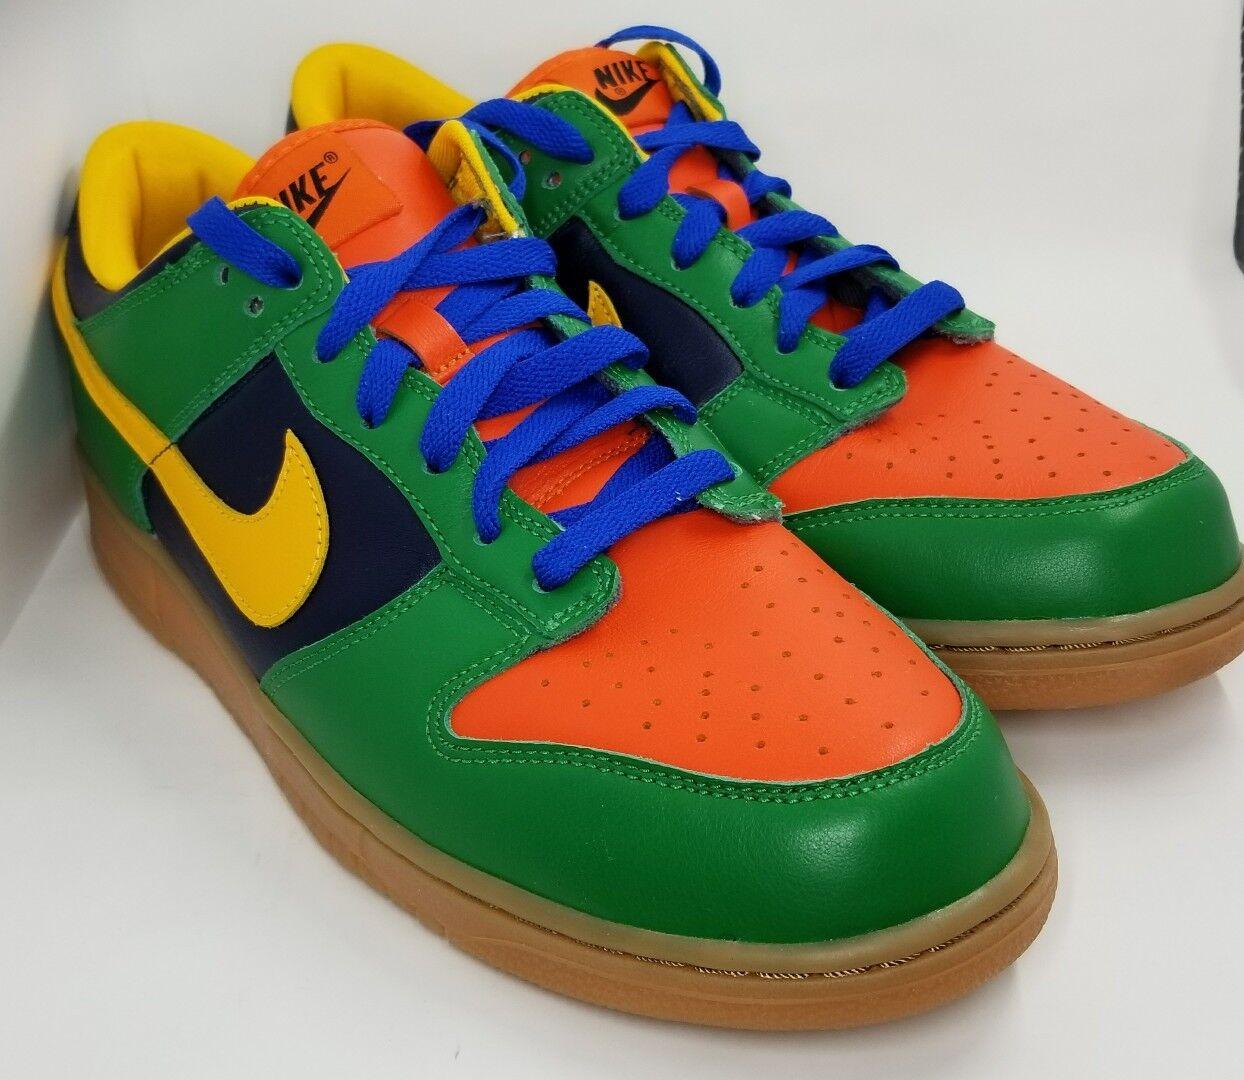 Nike Dunk Low ID SIZE 10.5 AH7979-991